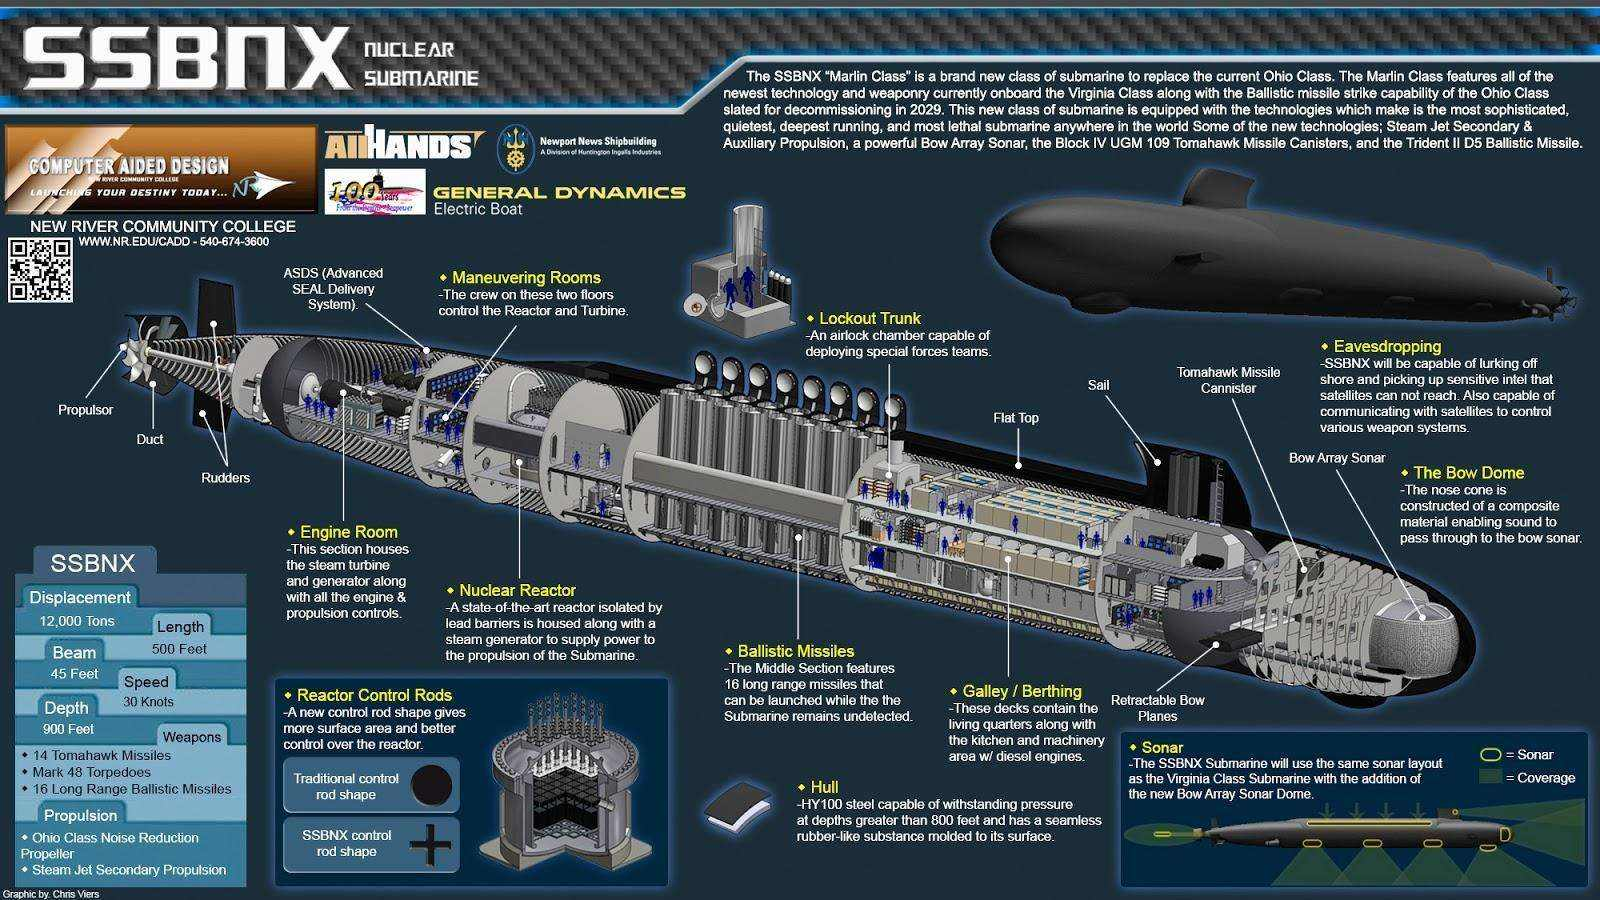 """094C能下潜1700米,巨浪-4射程2.2万"",谁在吹中国能毁灭美国"